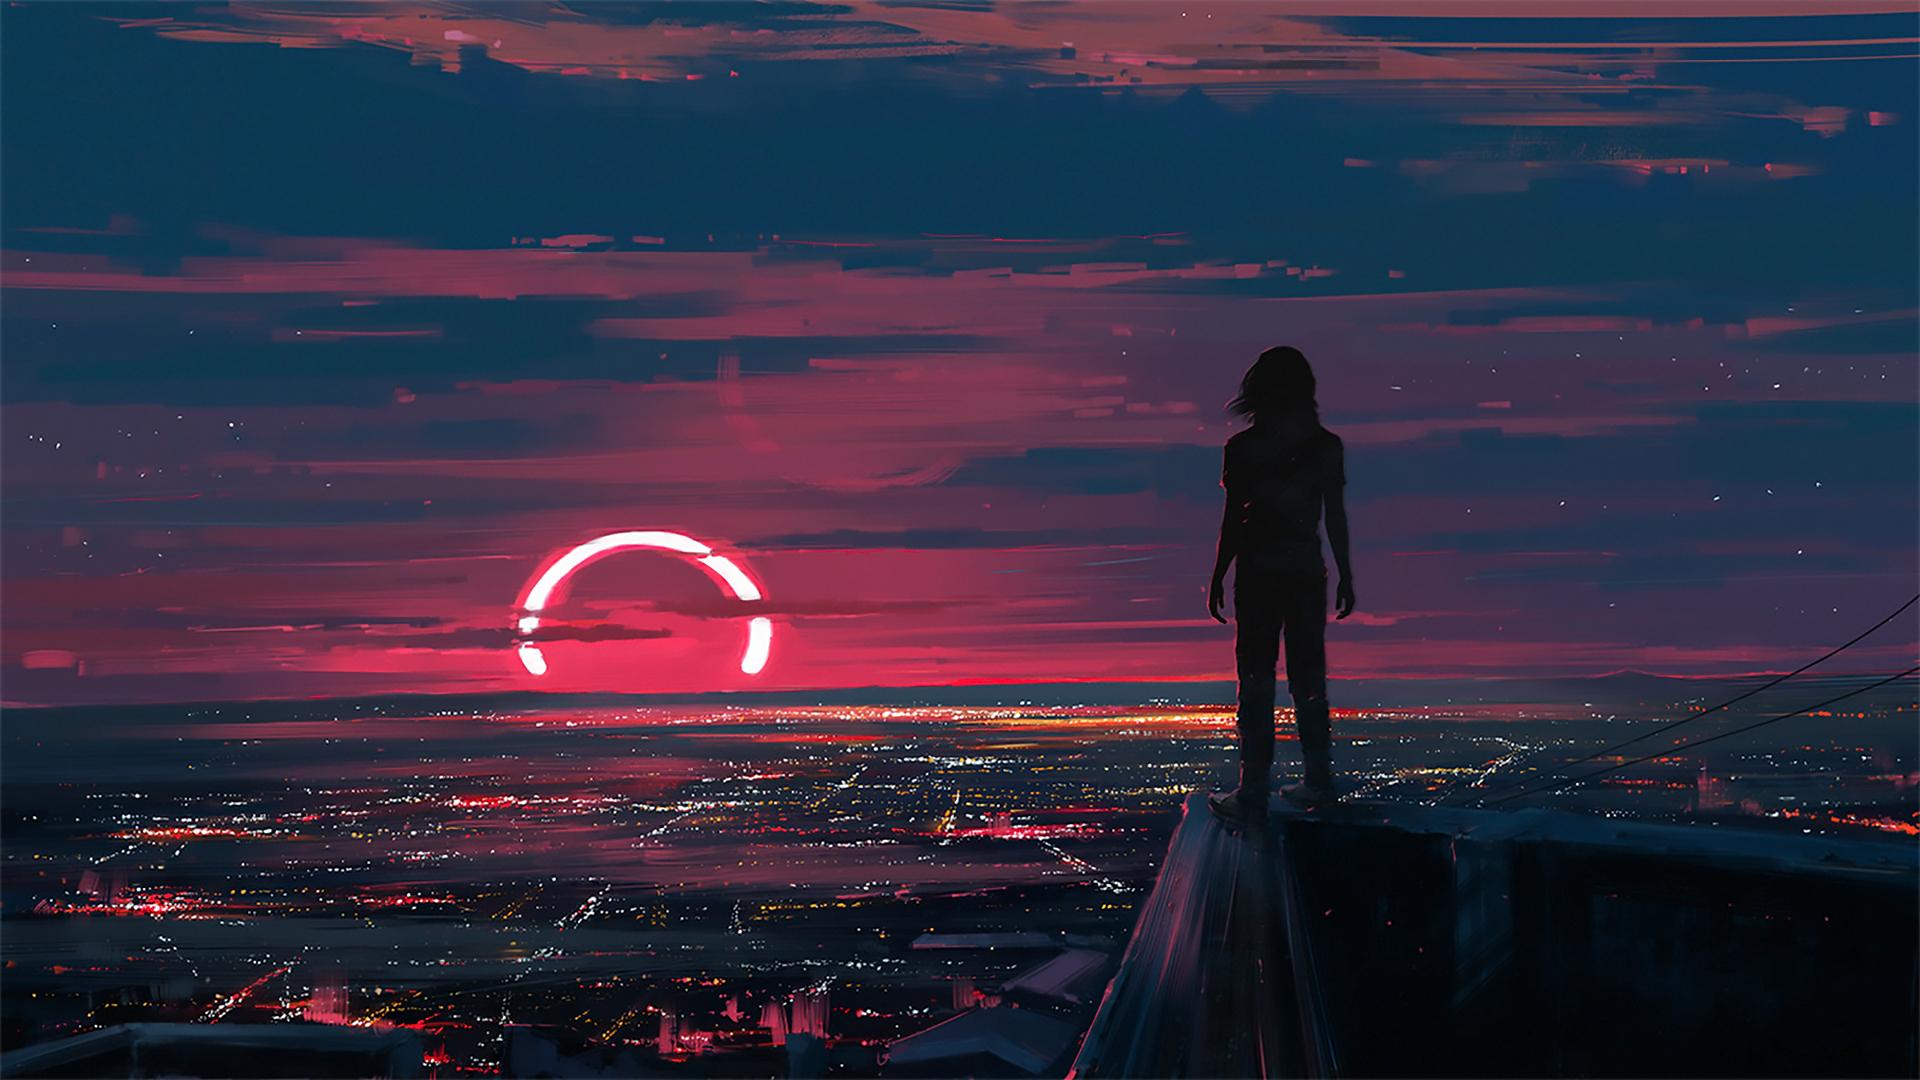 General 1920x1080 painting digital art drawing sunset Aenami